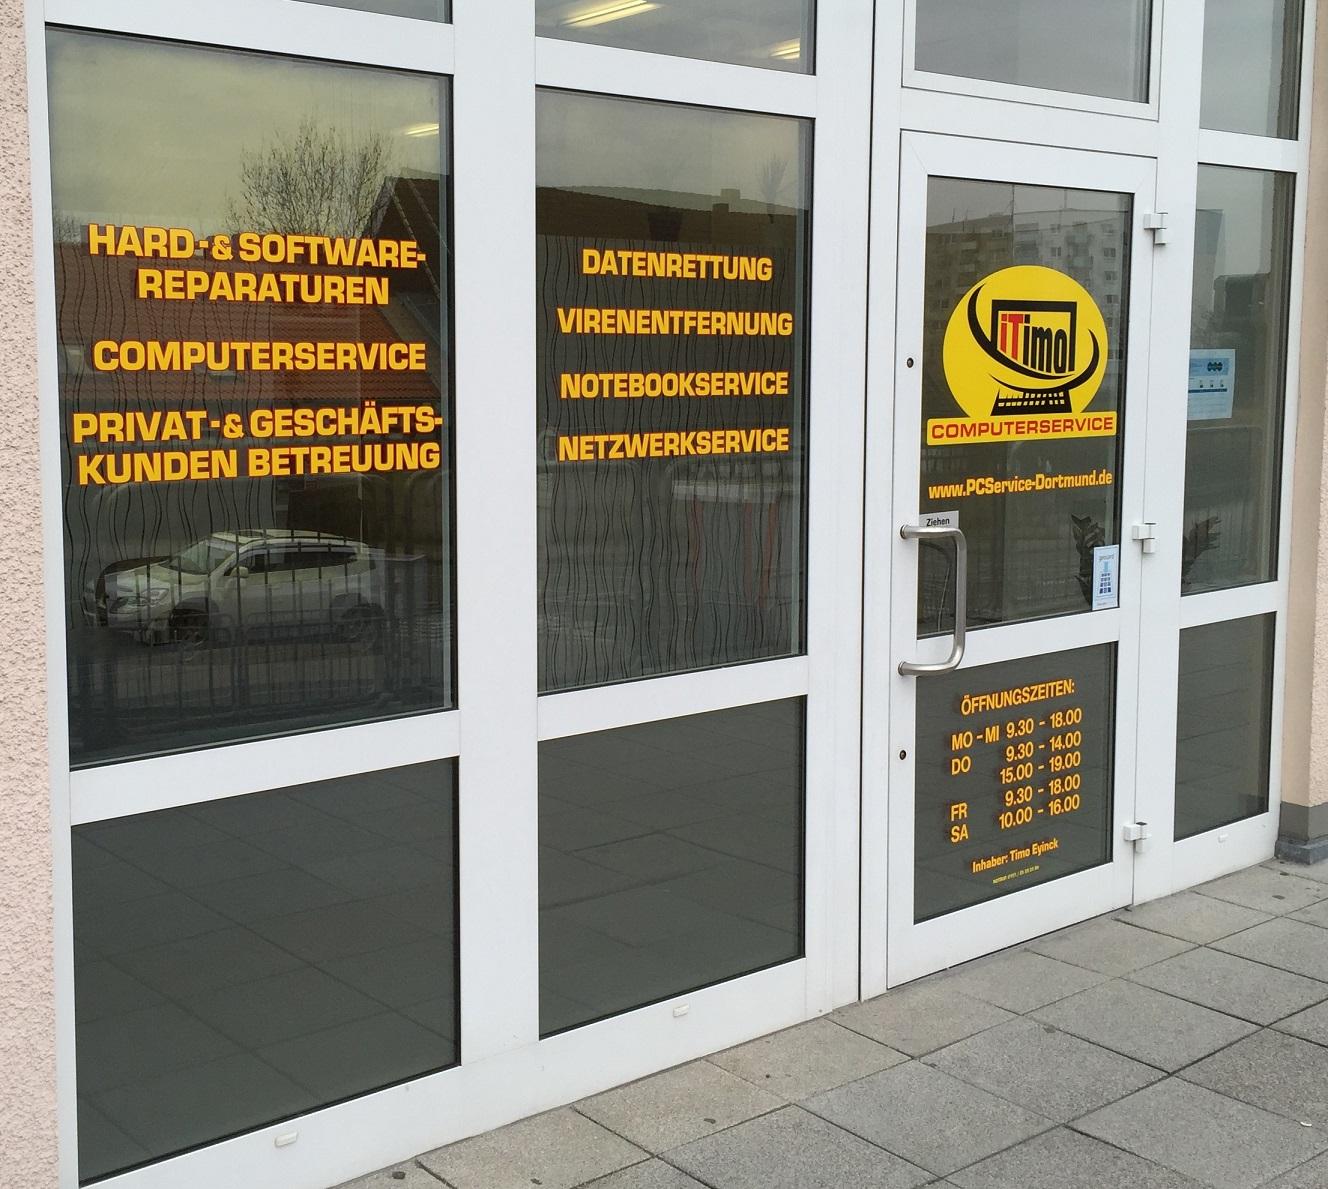 iTimo Computerservice Timo Eyinck, Aplerbecker Straße in Dortmund